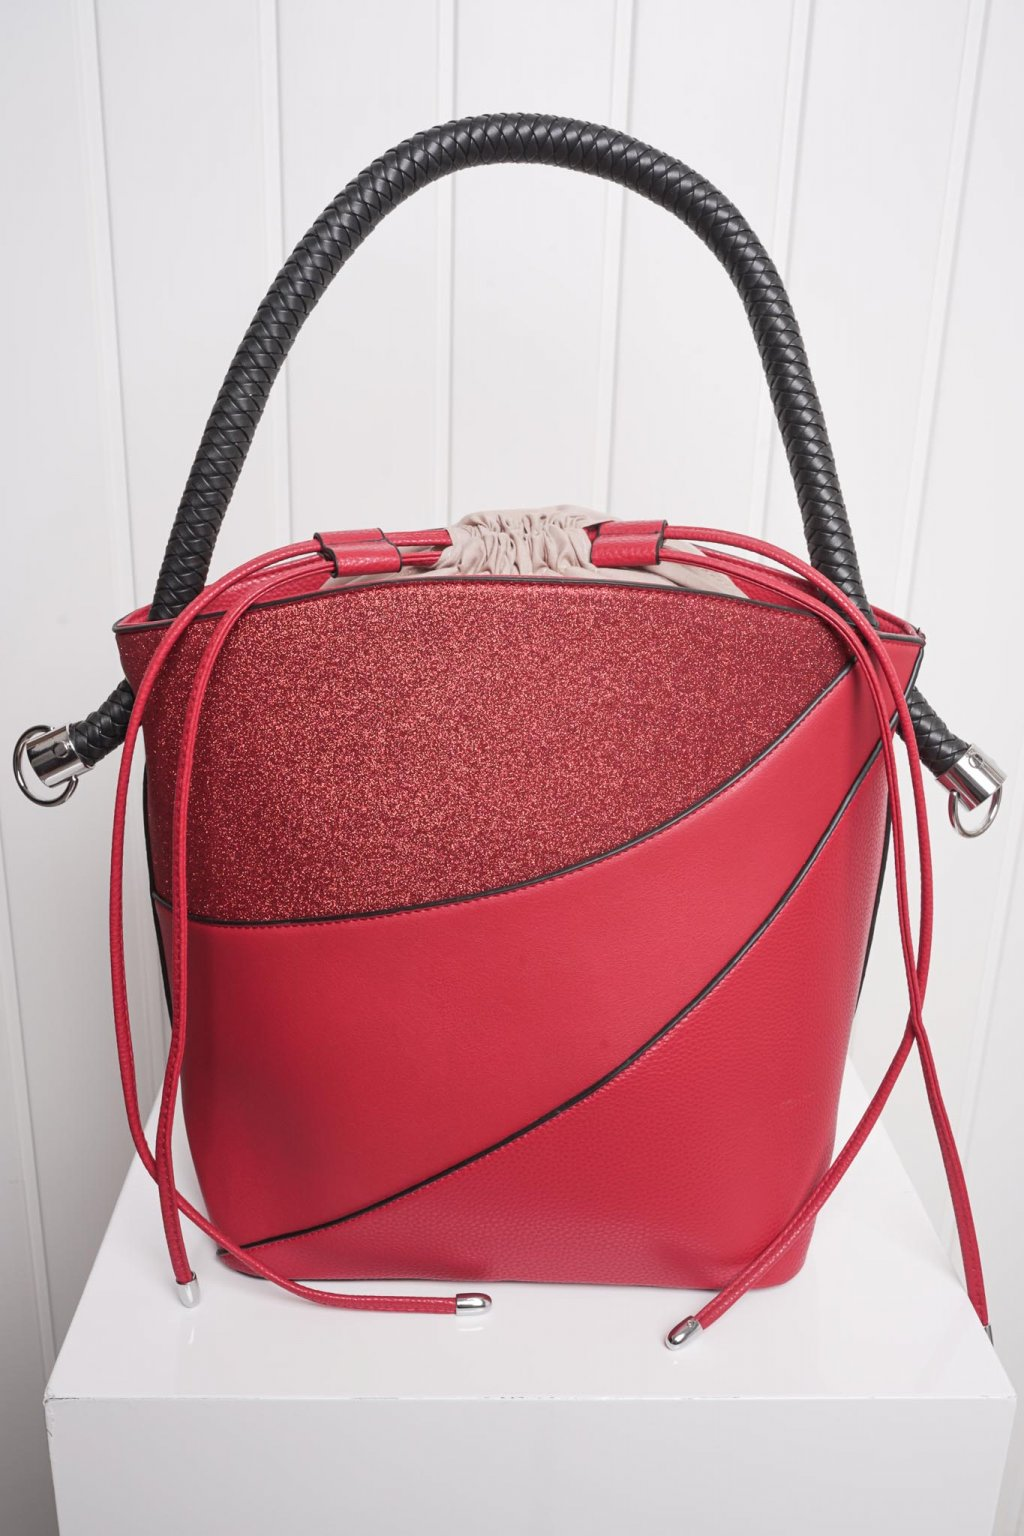 Kabelka, ruksak, dobrá cena, čierna kabelka, čierny ruksak, basic, kabelky, ruksaky 038